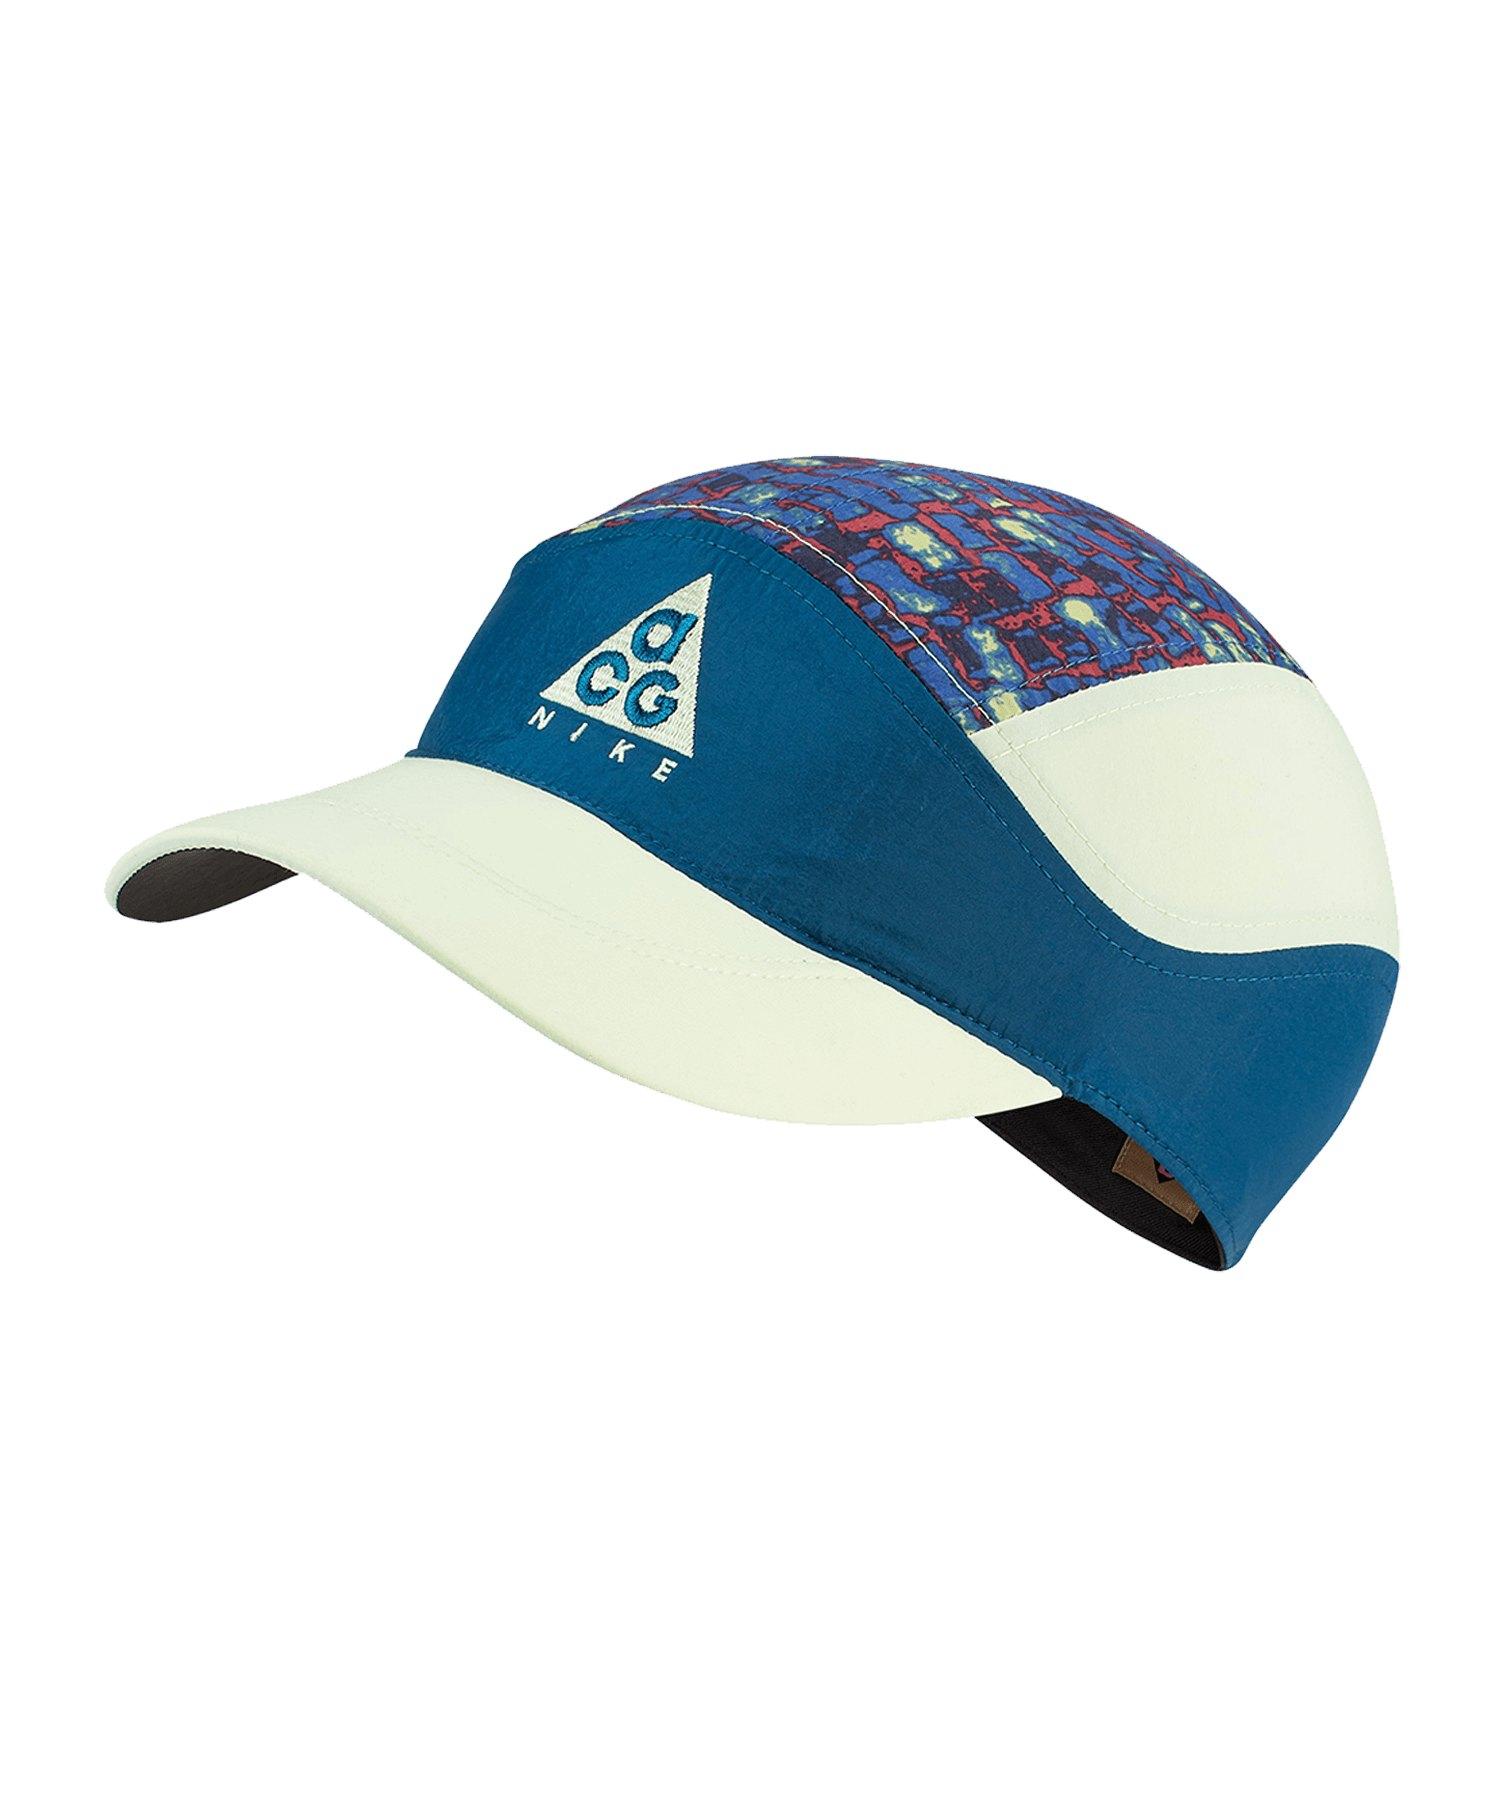 Nike ACG Tailwind Cap Blau F474 - blau